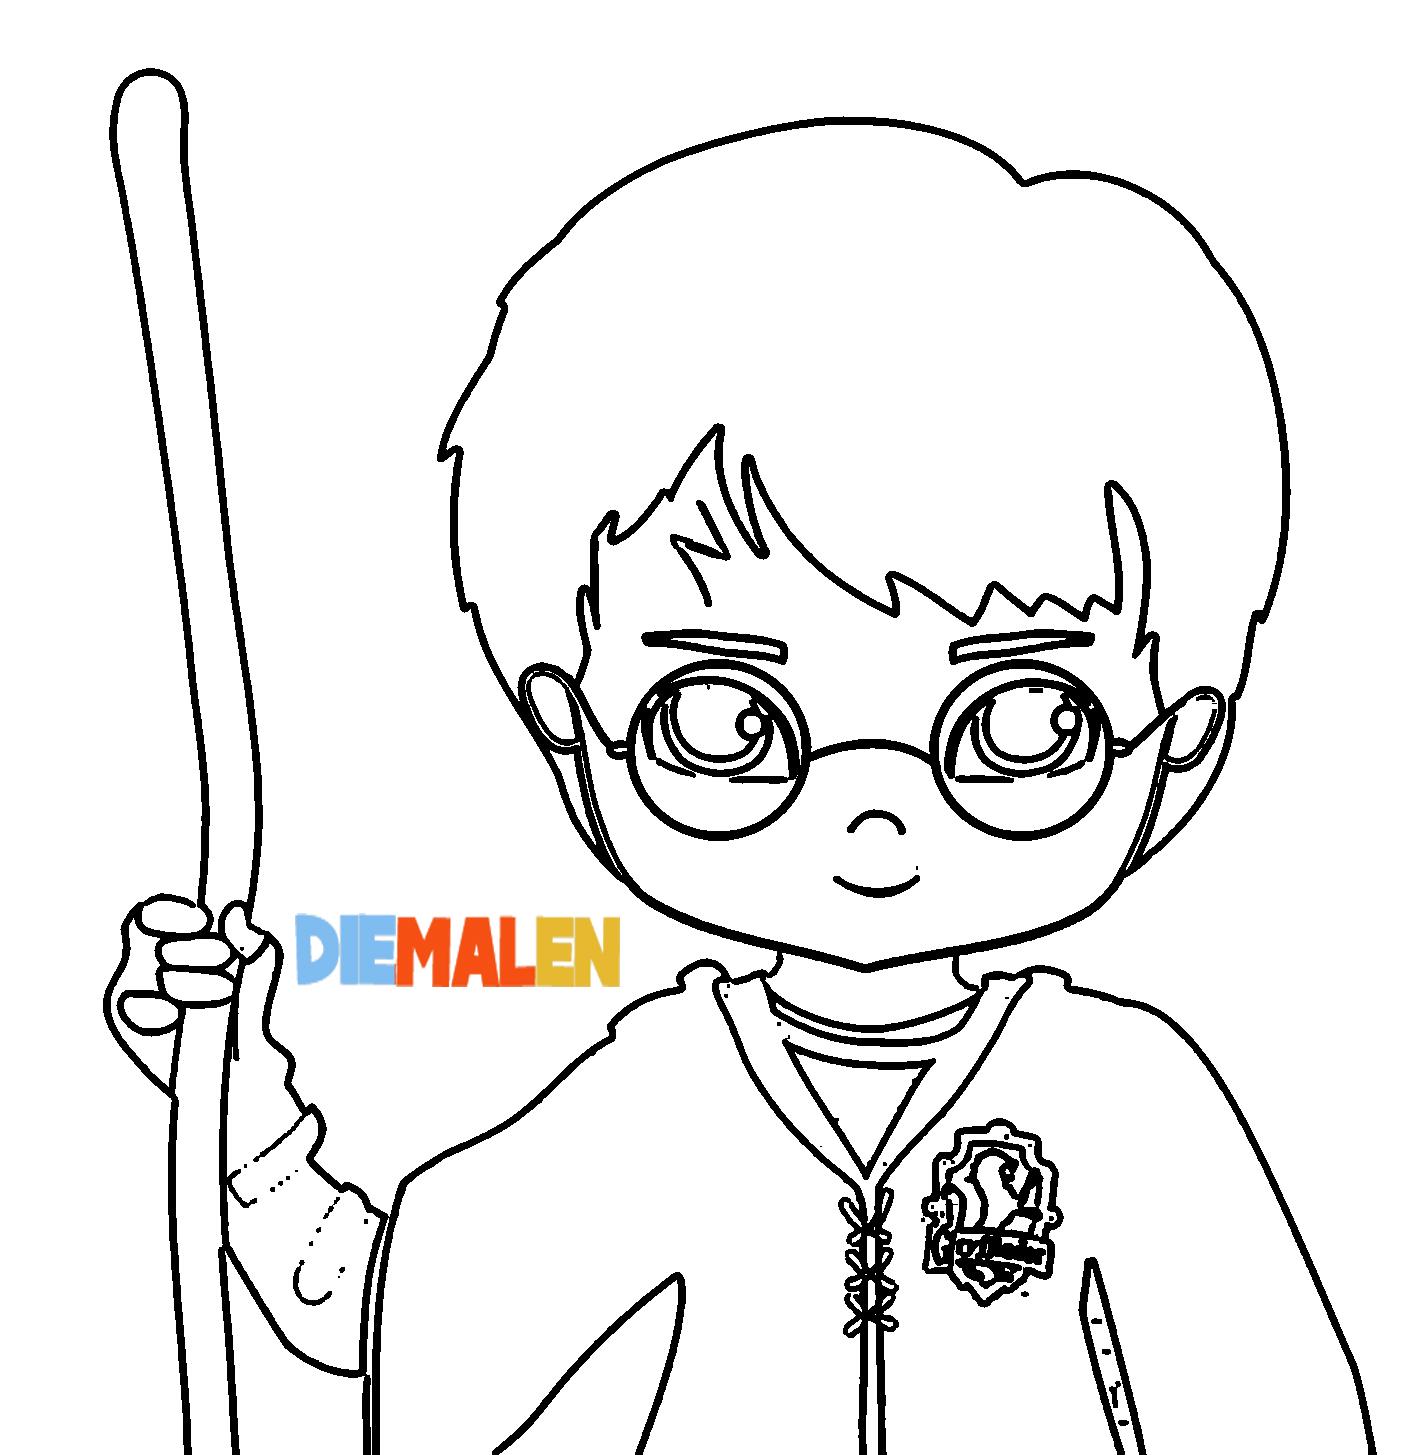 Harry Potter Ausmalbilder → DieMalen.com